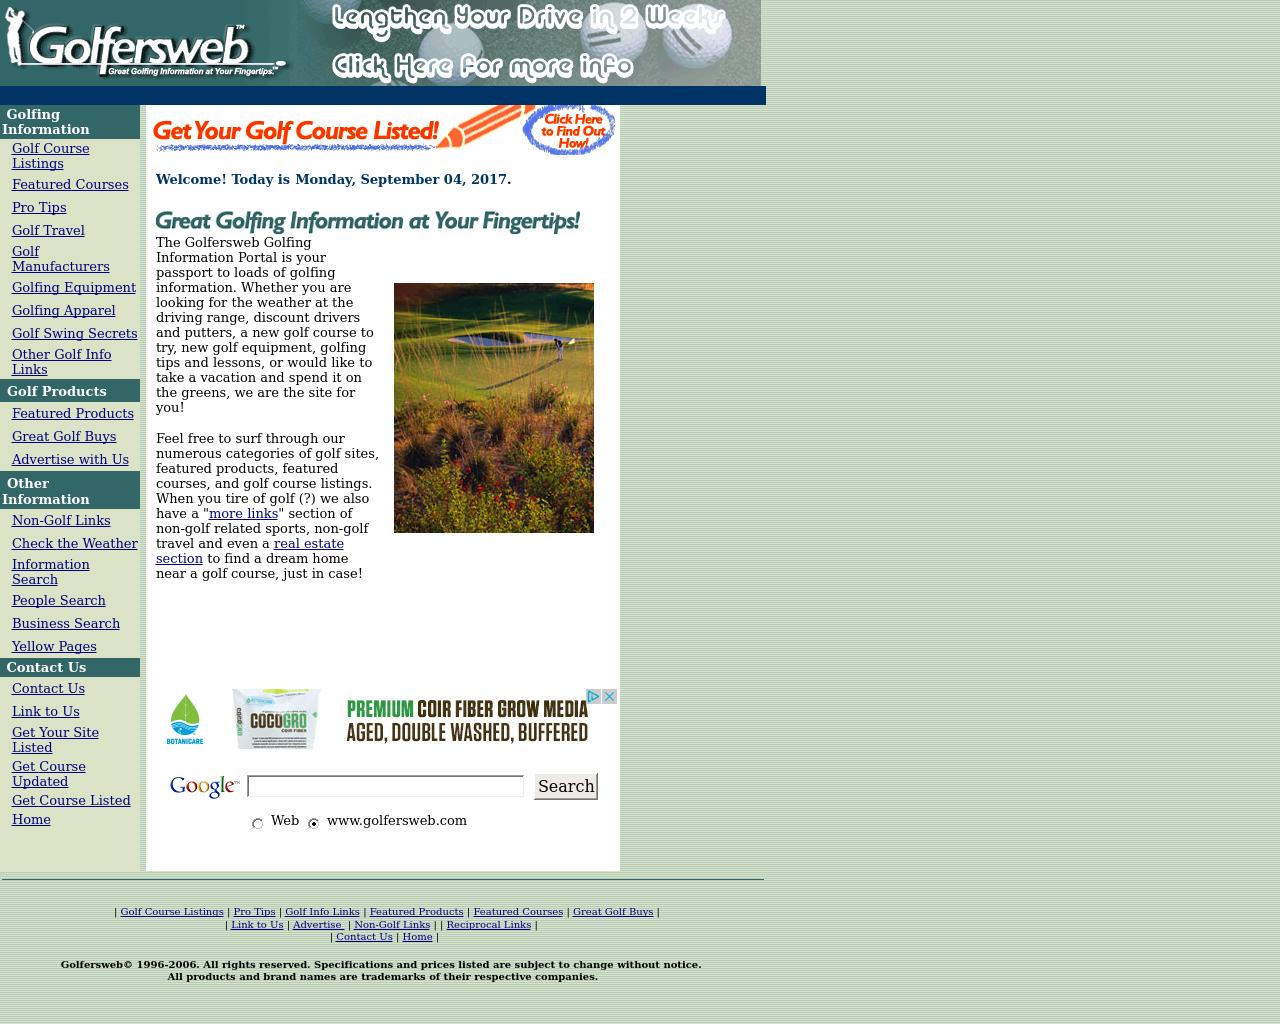 Golfersweb-Advertising-Reviews-Pricing